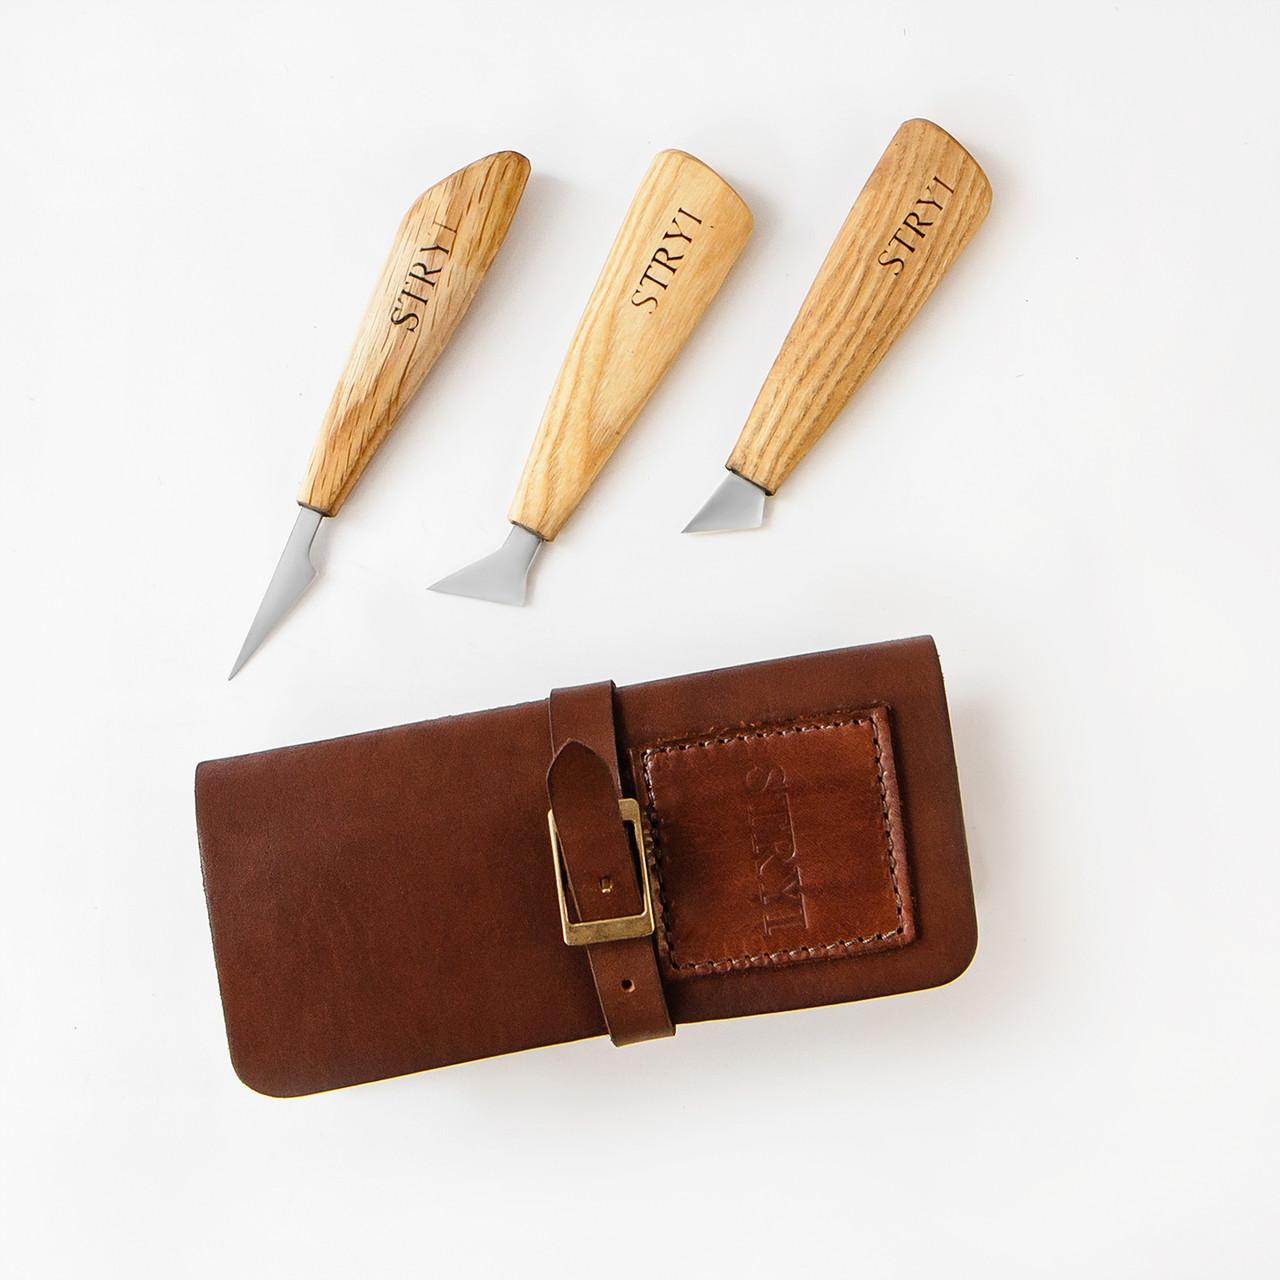 Кожаный чехол на 3 ножа от STRYI